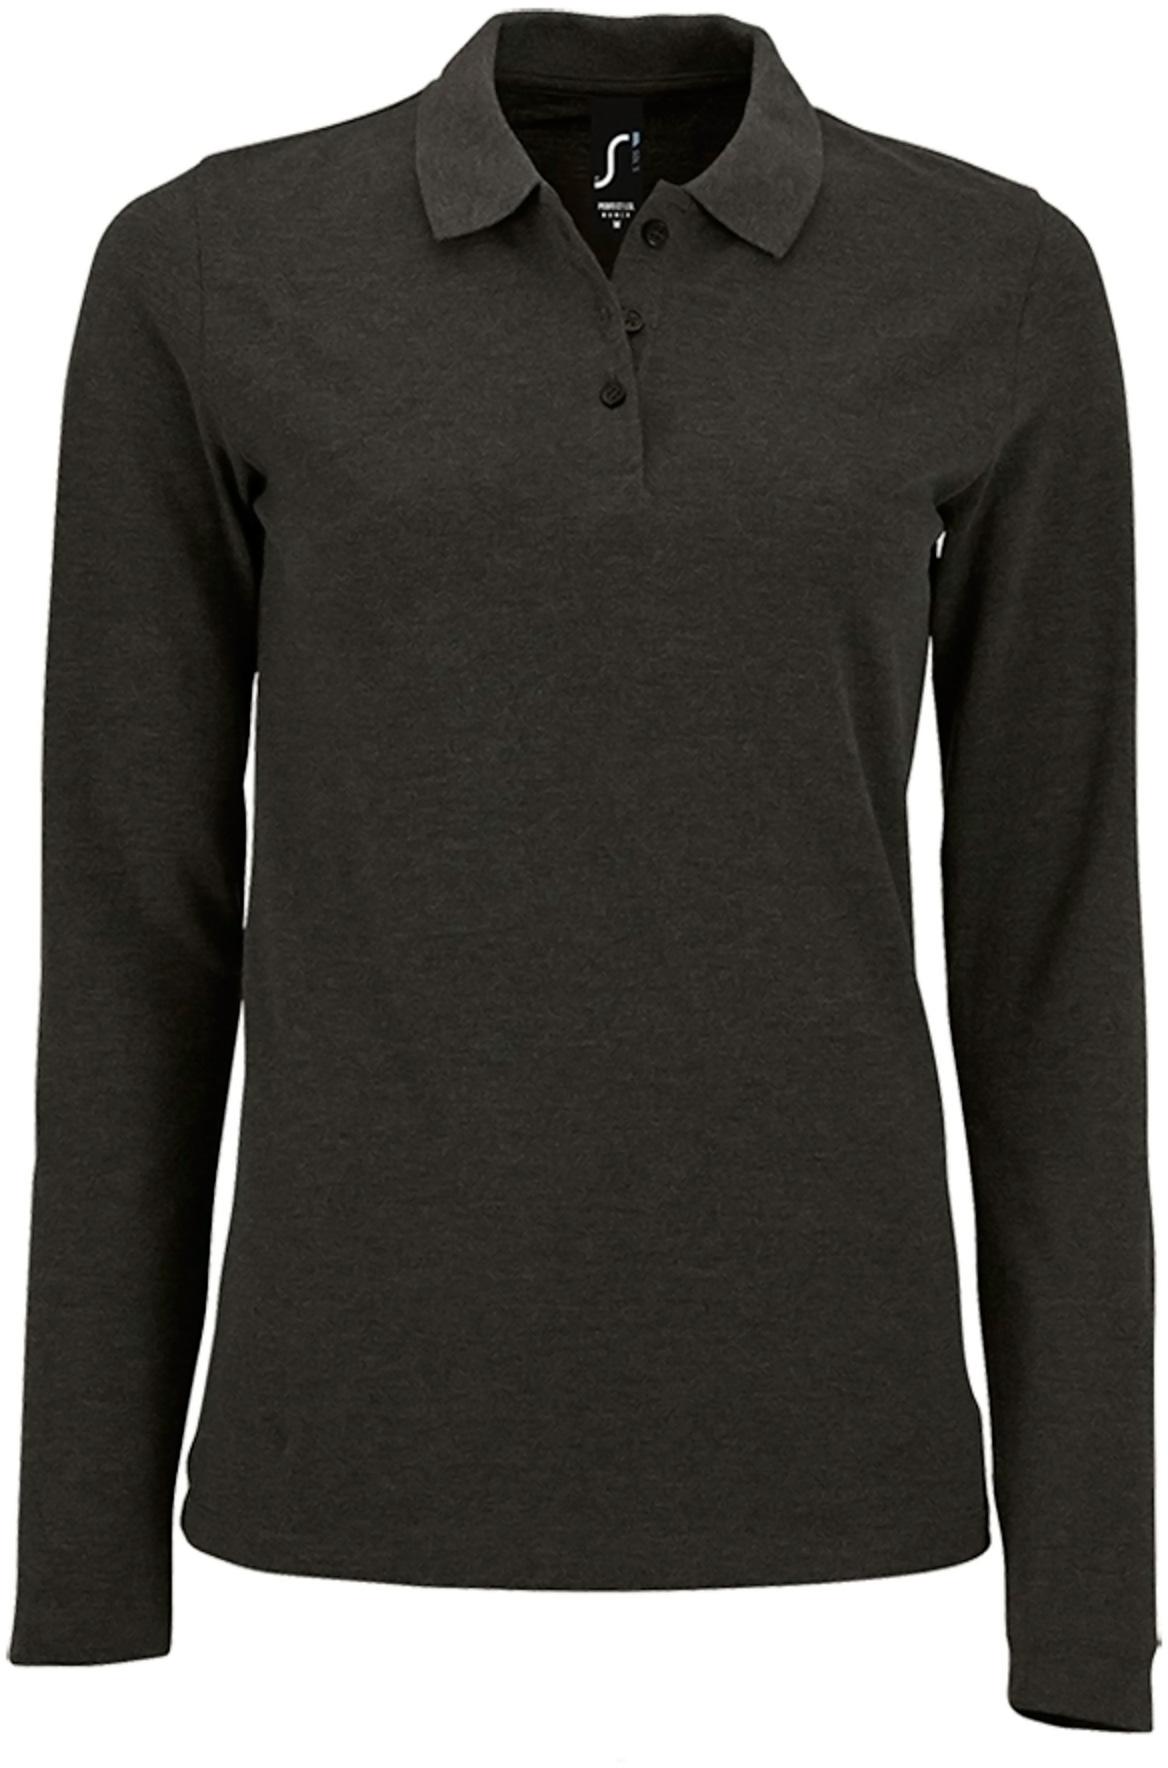 fb85f1d5b06 Рубашка поло «Perfect LSL Women»с длинным рукавом